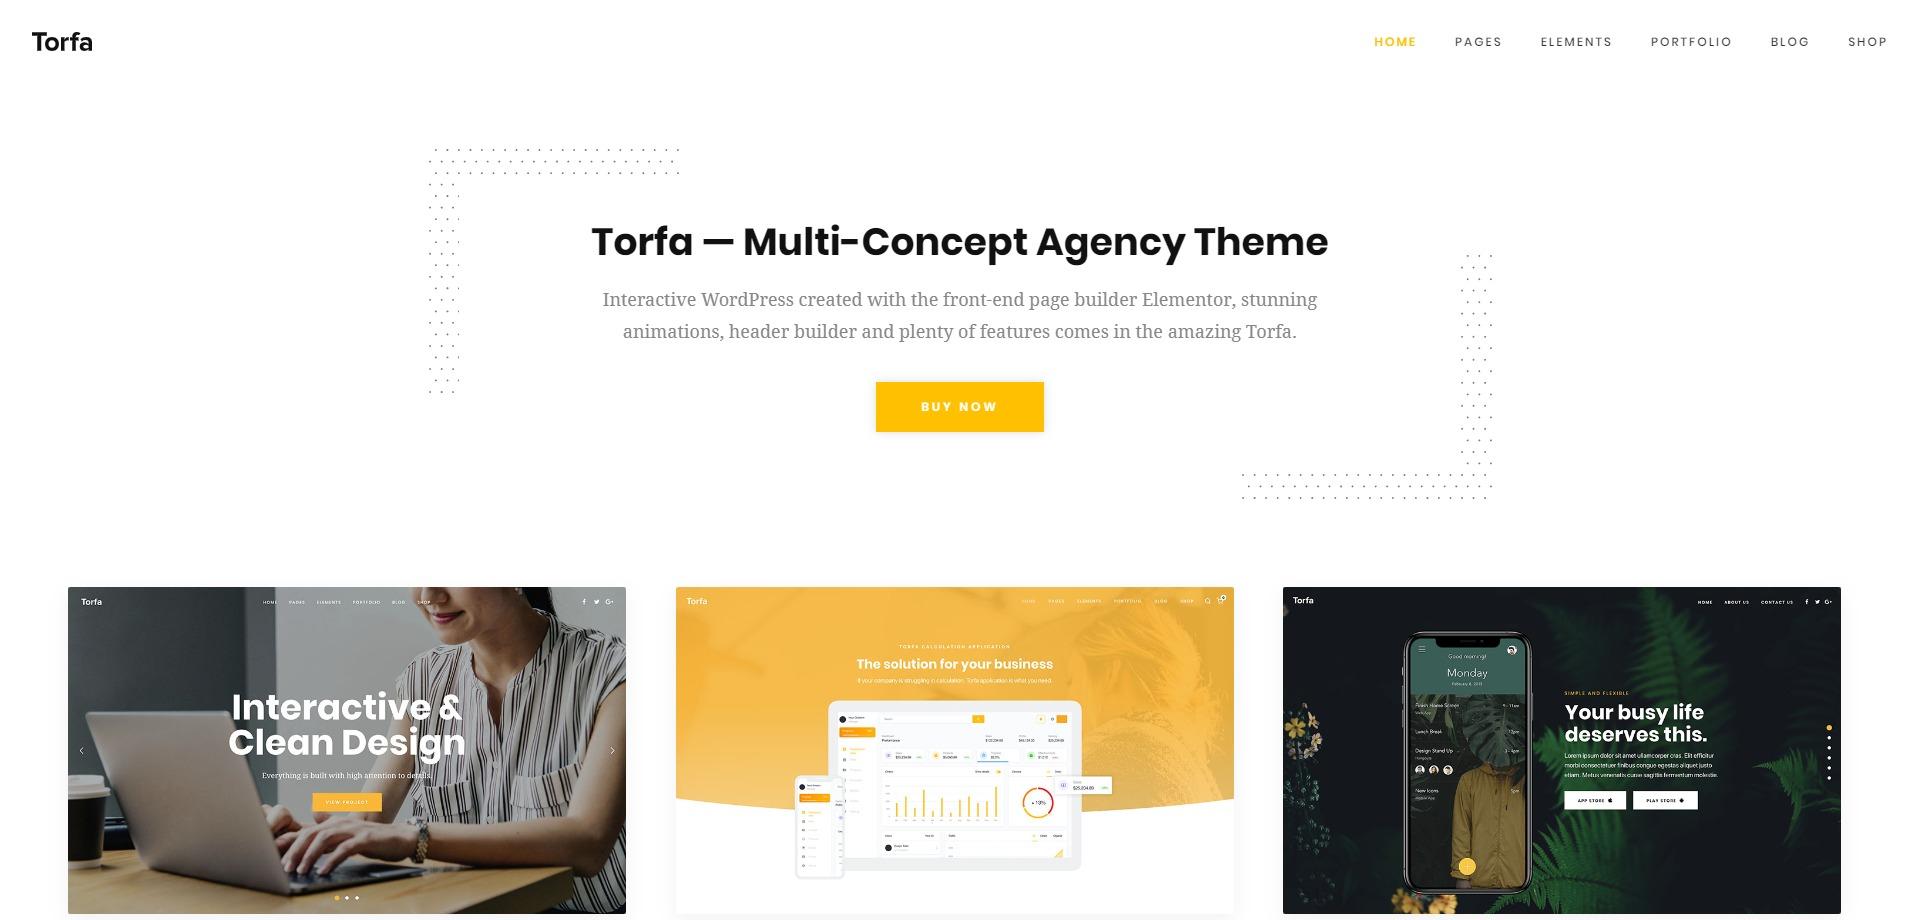 Torfa-可视化摄影博客图片企业WordPress主题